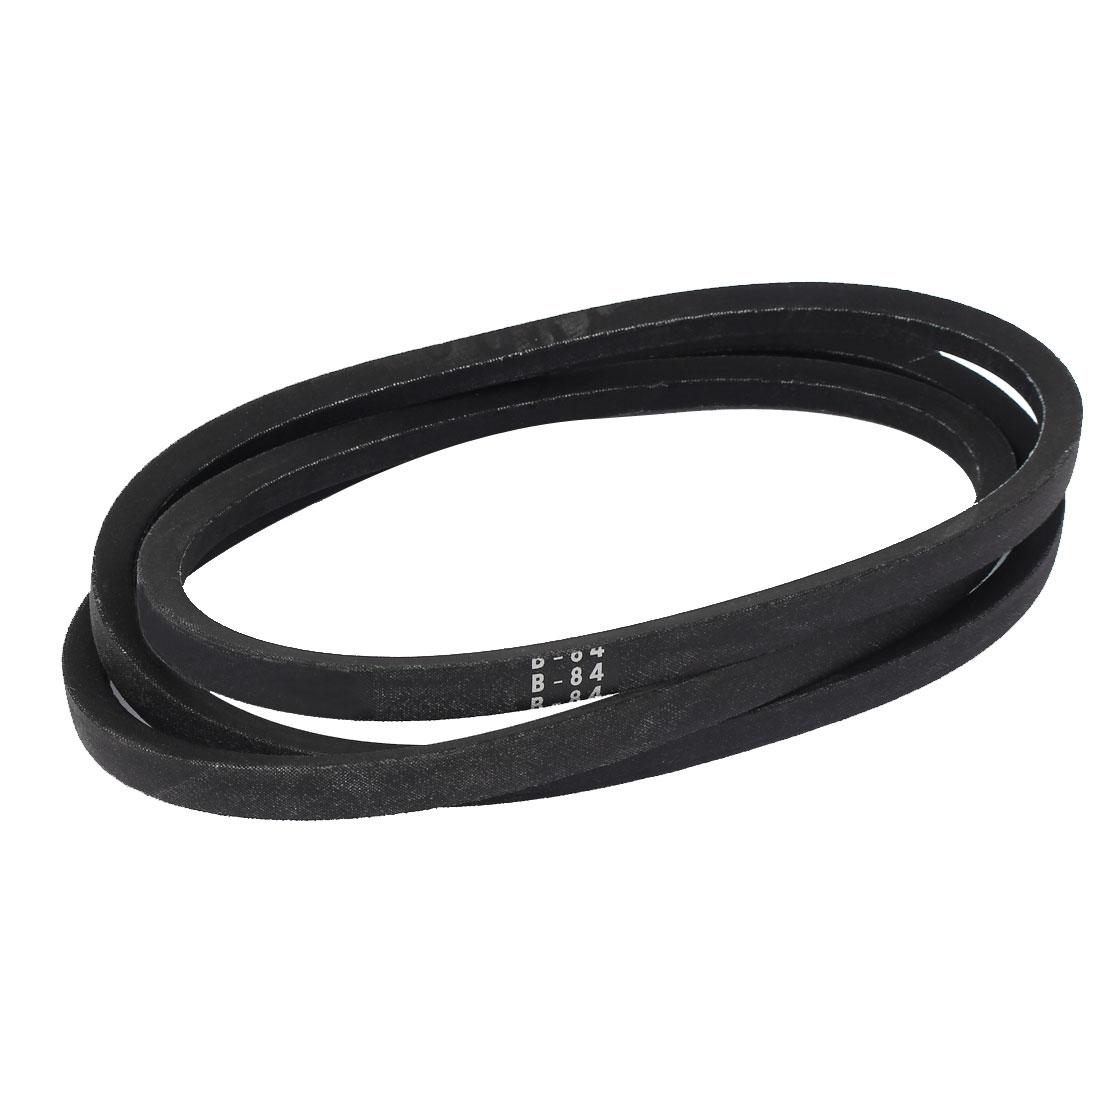 "B84 84"" x 0.67"" Industrial Machine Rubber Drive Belt V-Belt"